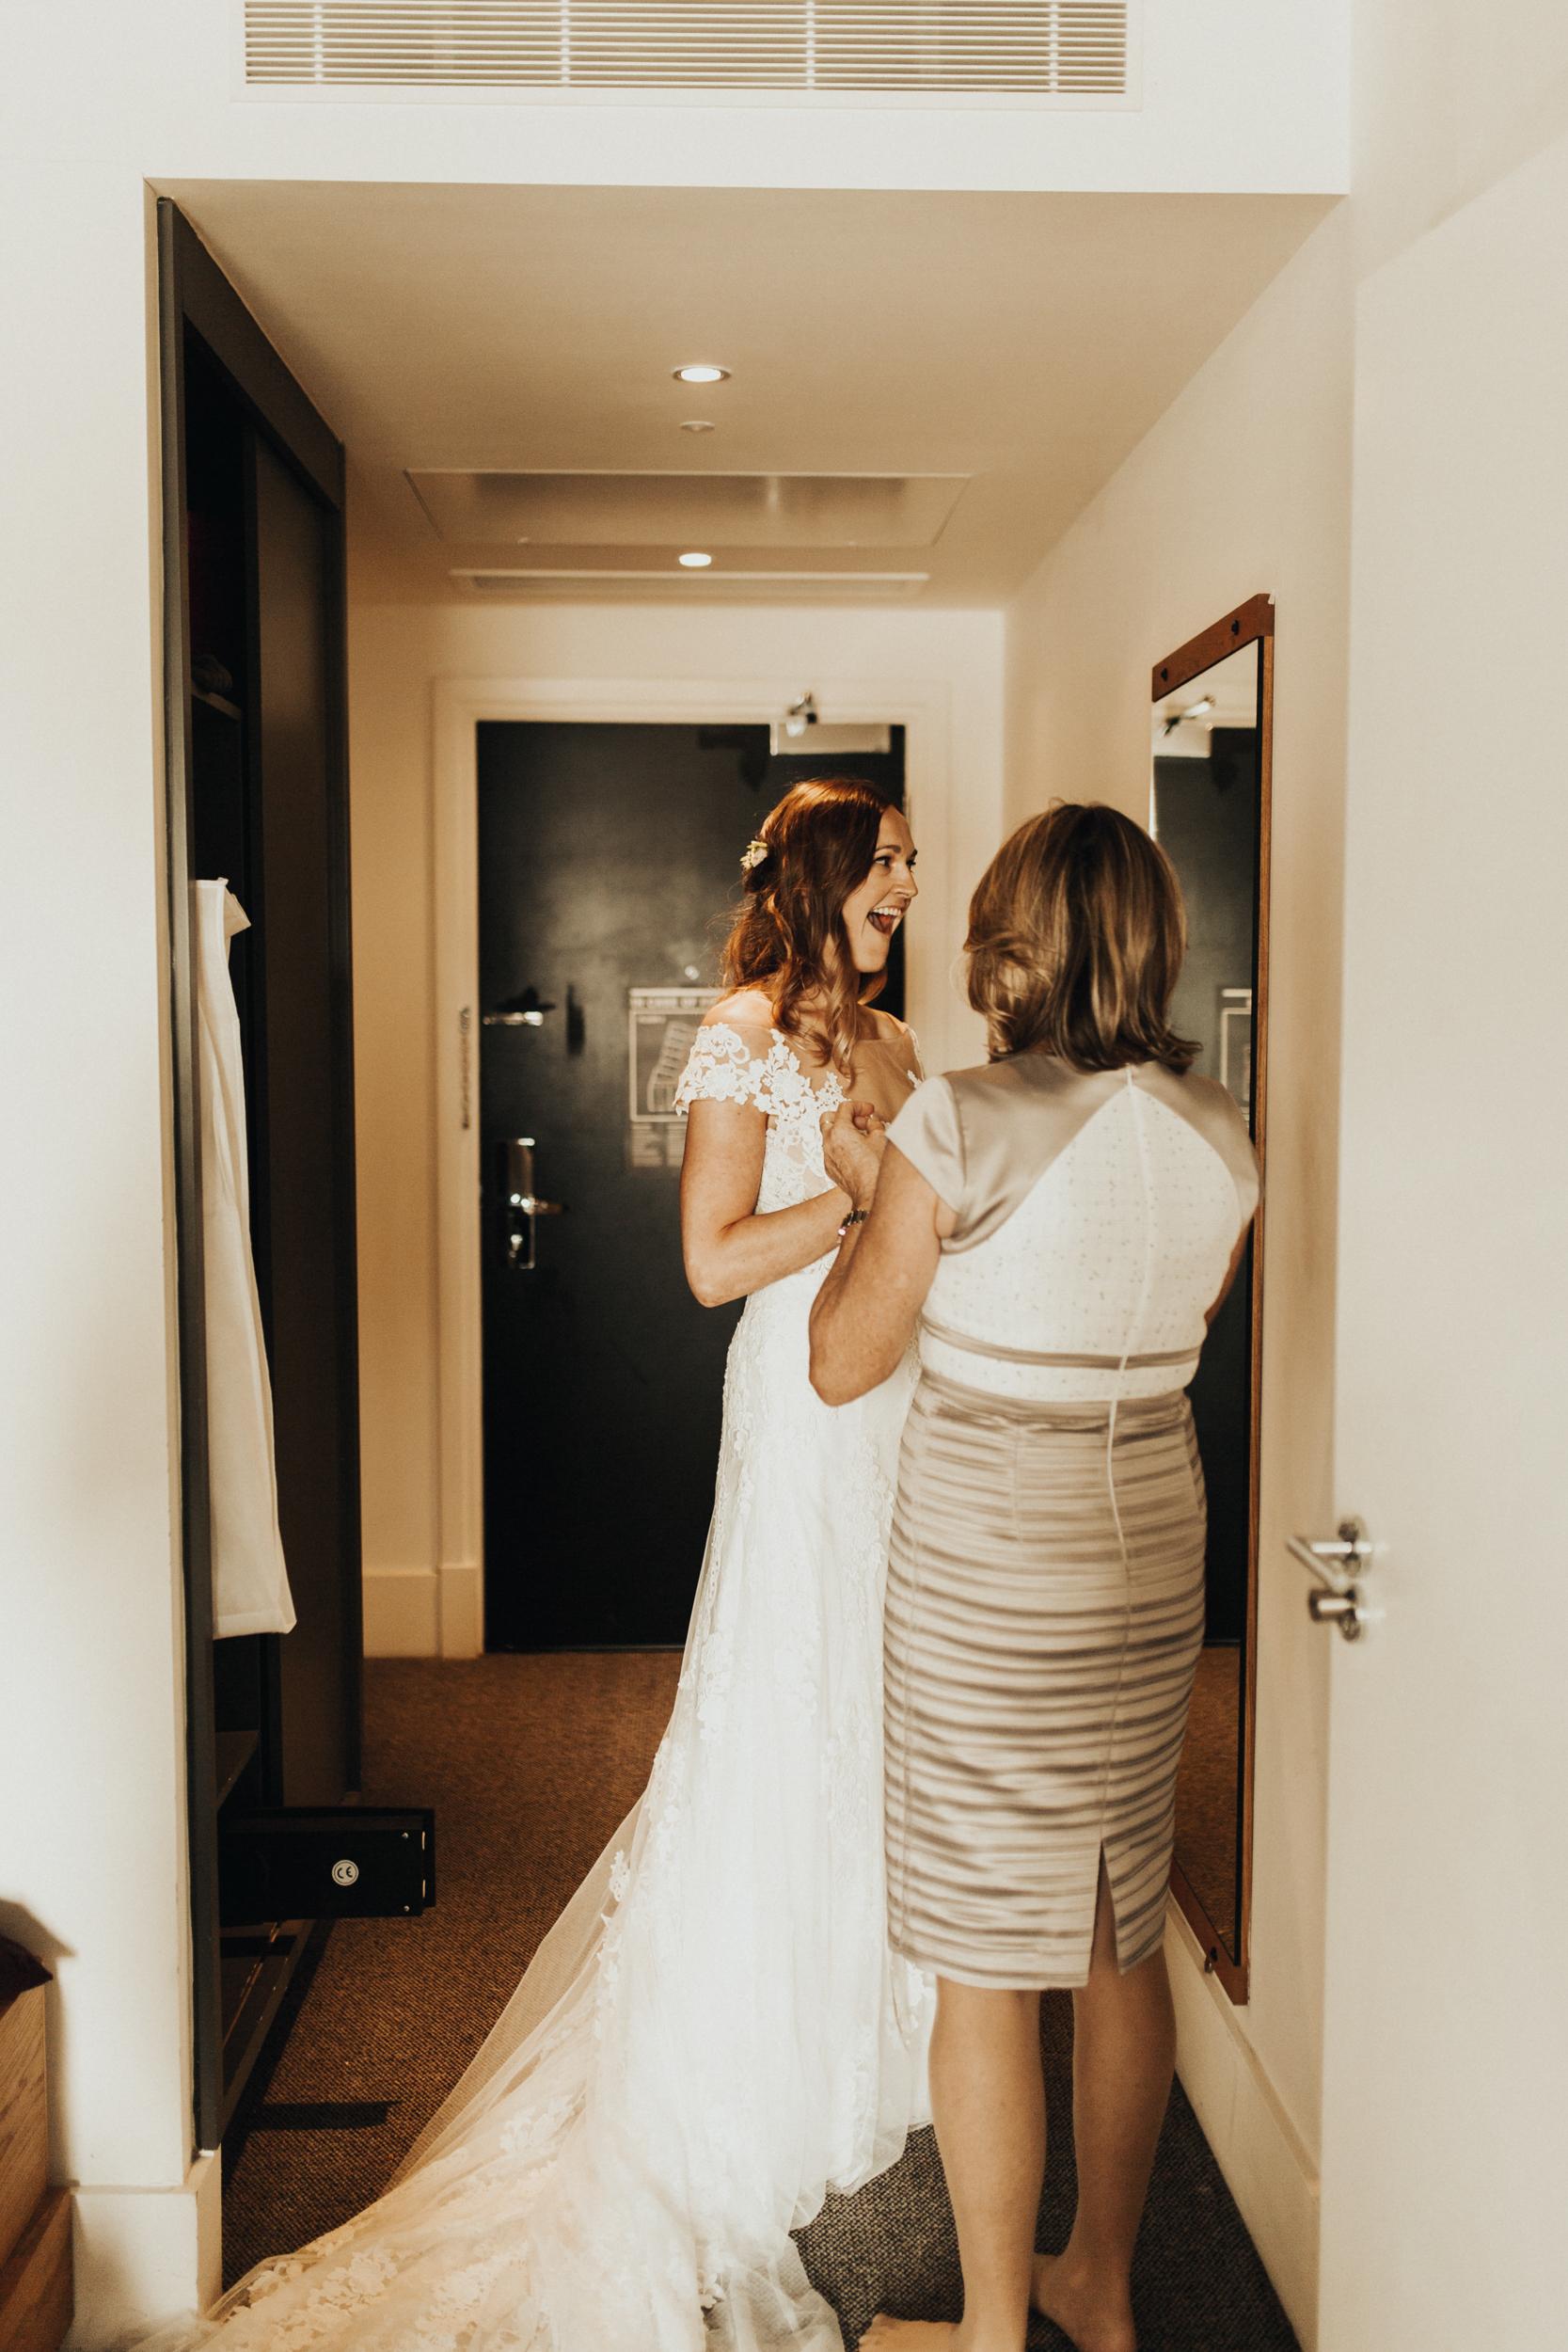 Laura-Benn-The-Asylum-London-The-Ace-Hotel-Wedding-Alternative-Darina-Stoda-Photography-53.jpg